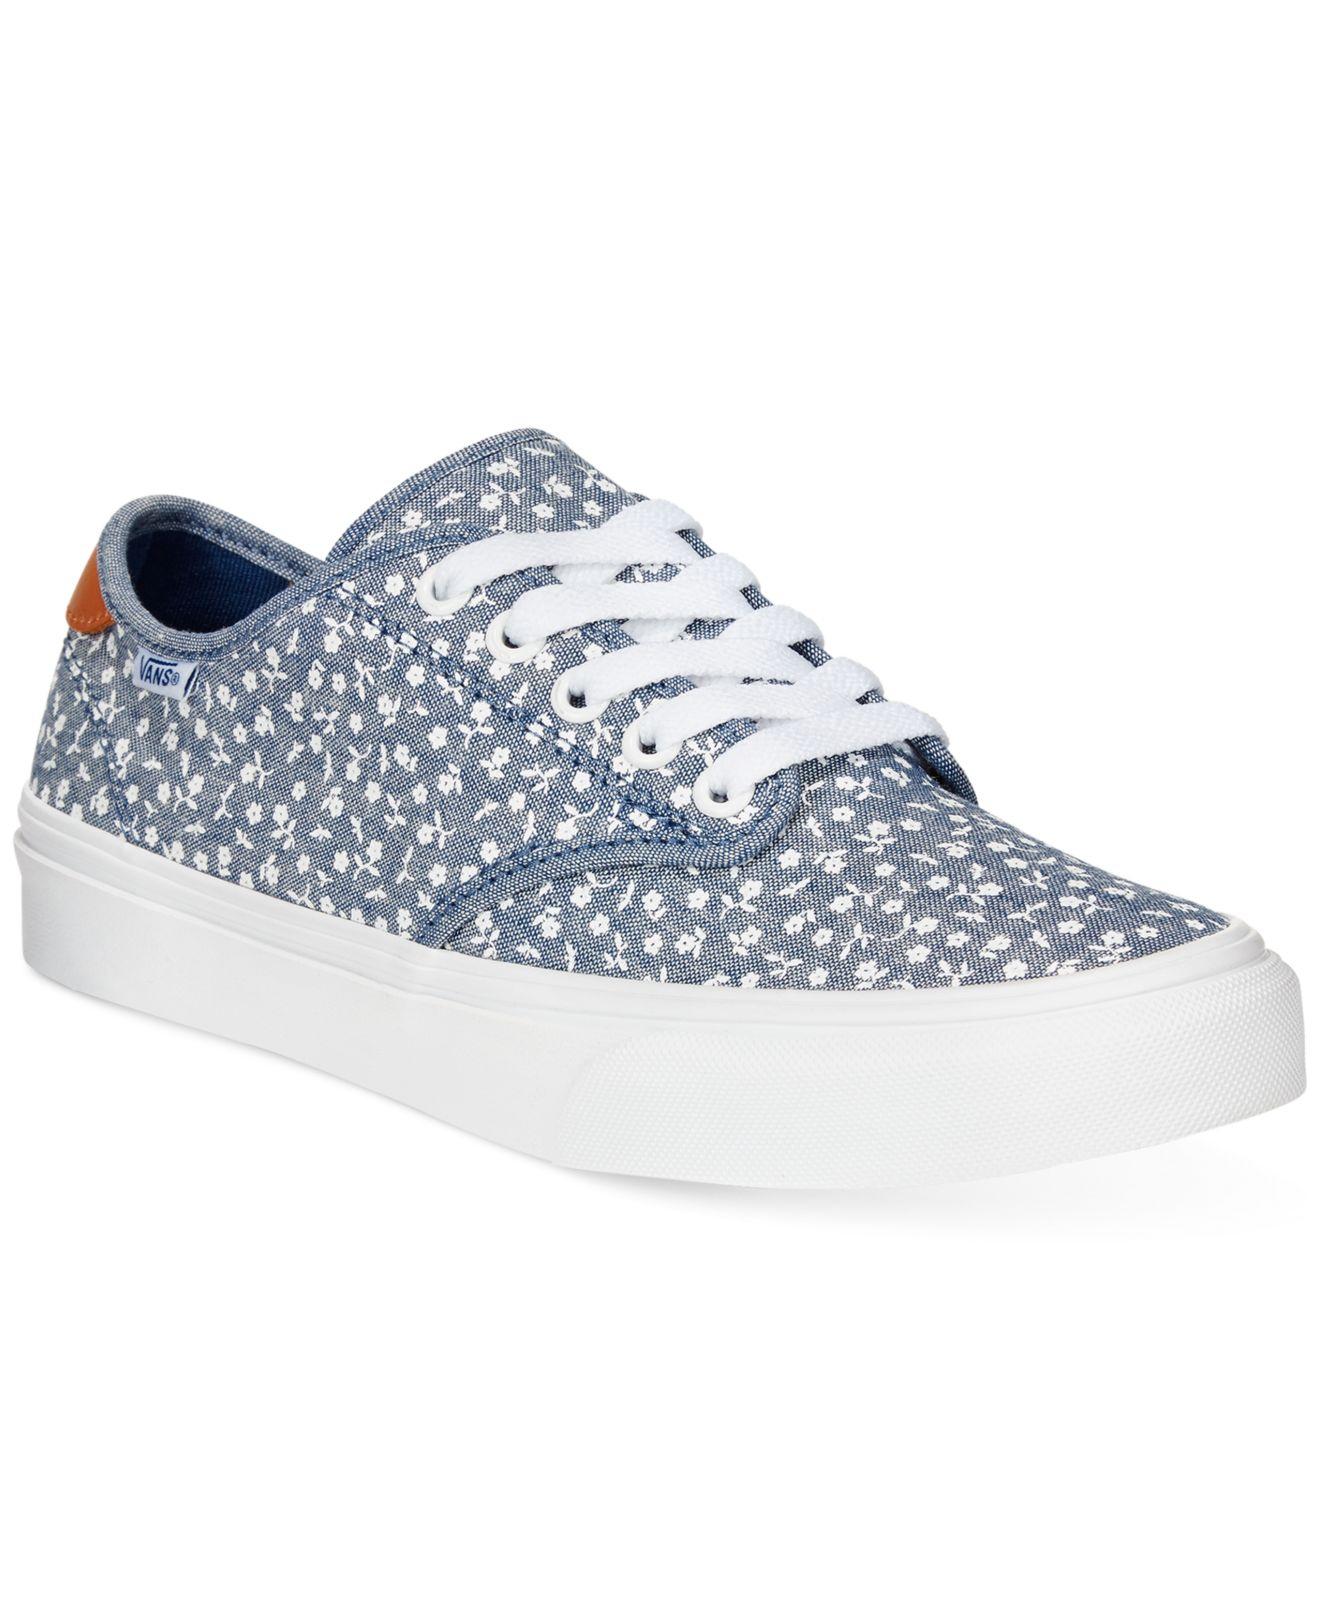 c517cae6513 Lyst - Vans Women s Camden Lace-up Sneakers in Blue